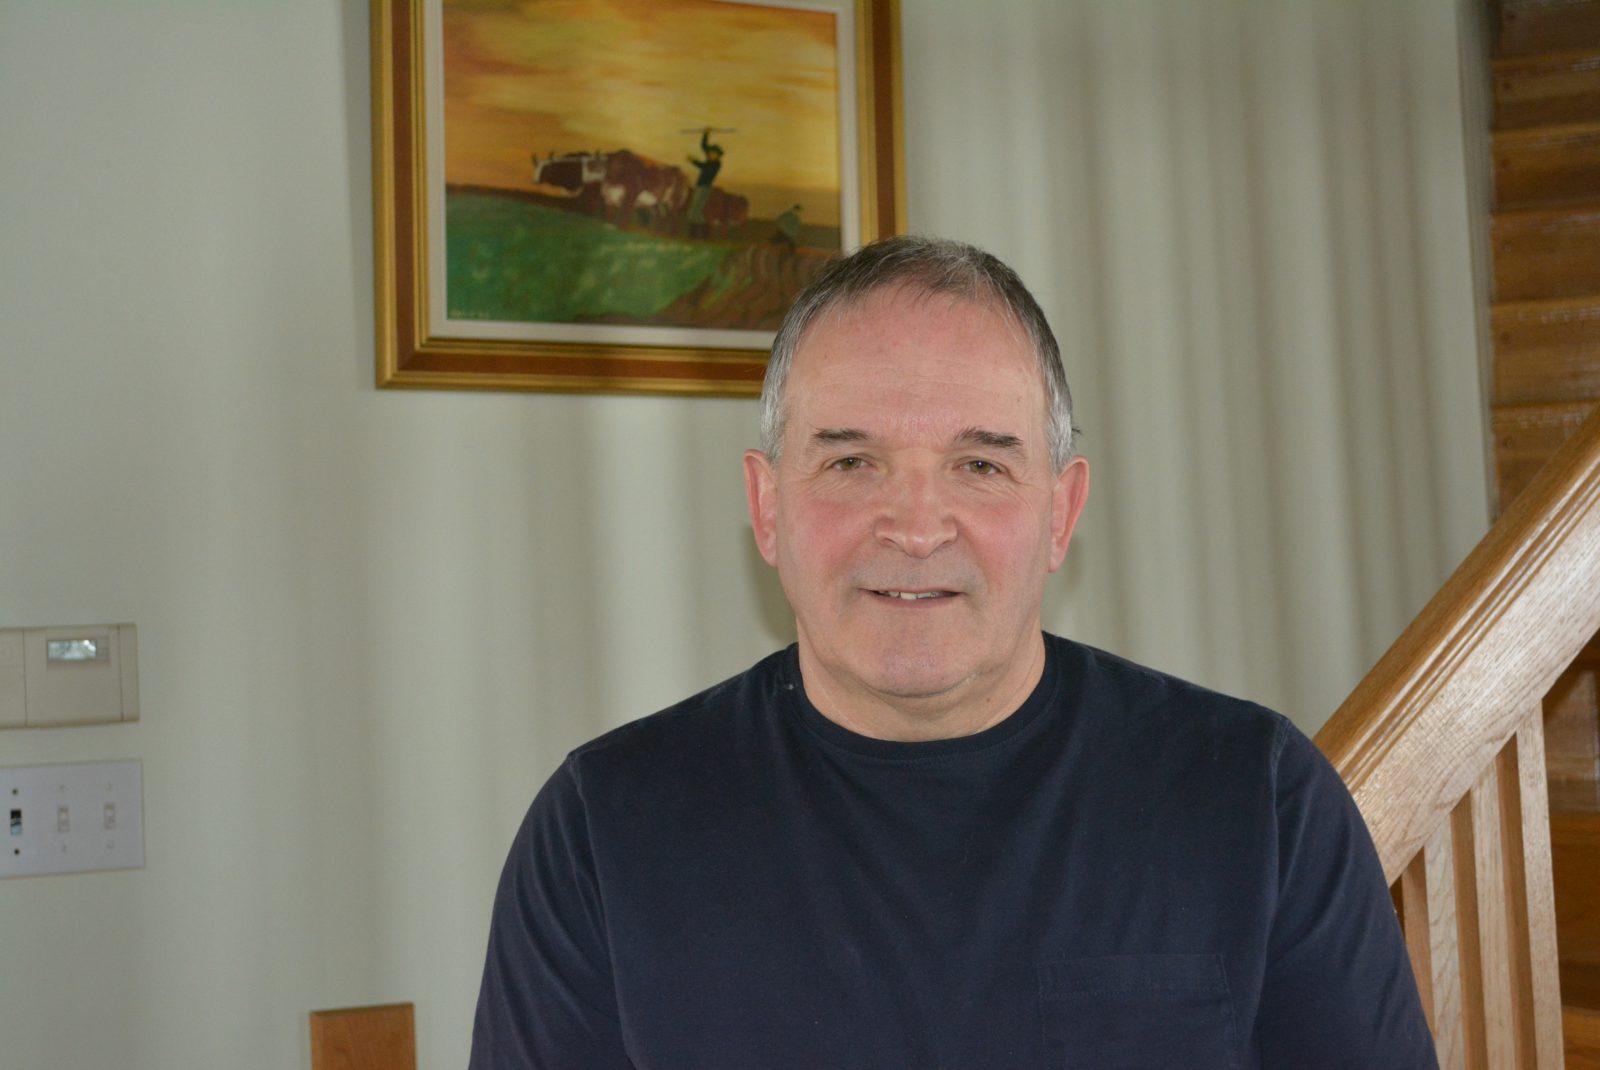 Michel Thibodeau